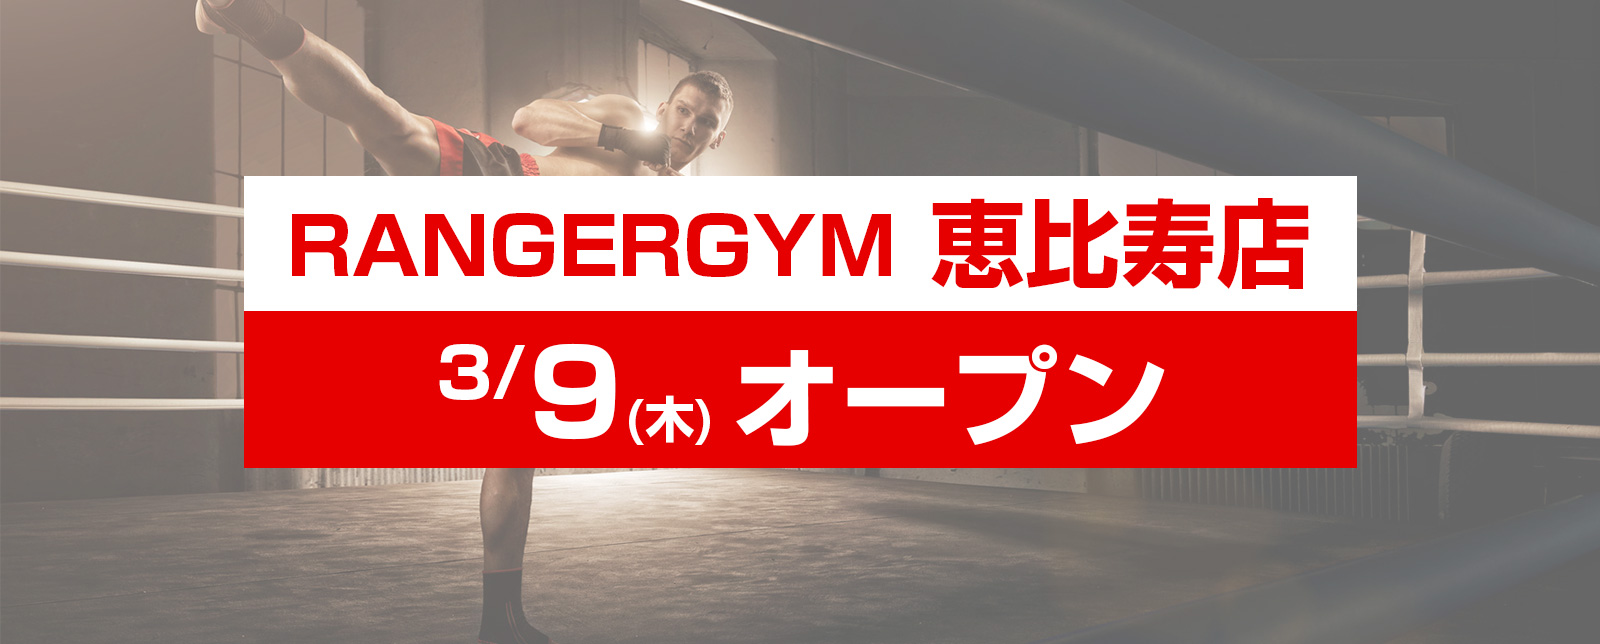 RANGERGYM 恵比寿店オープン